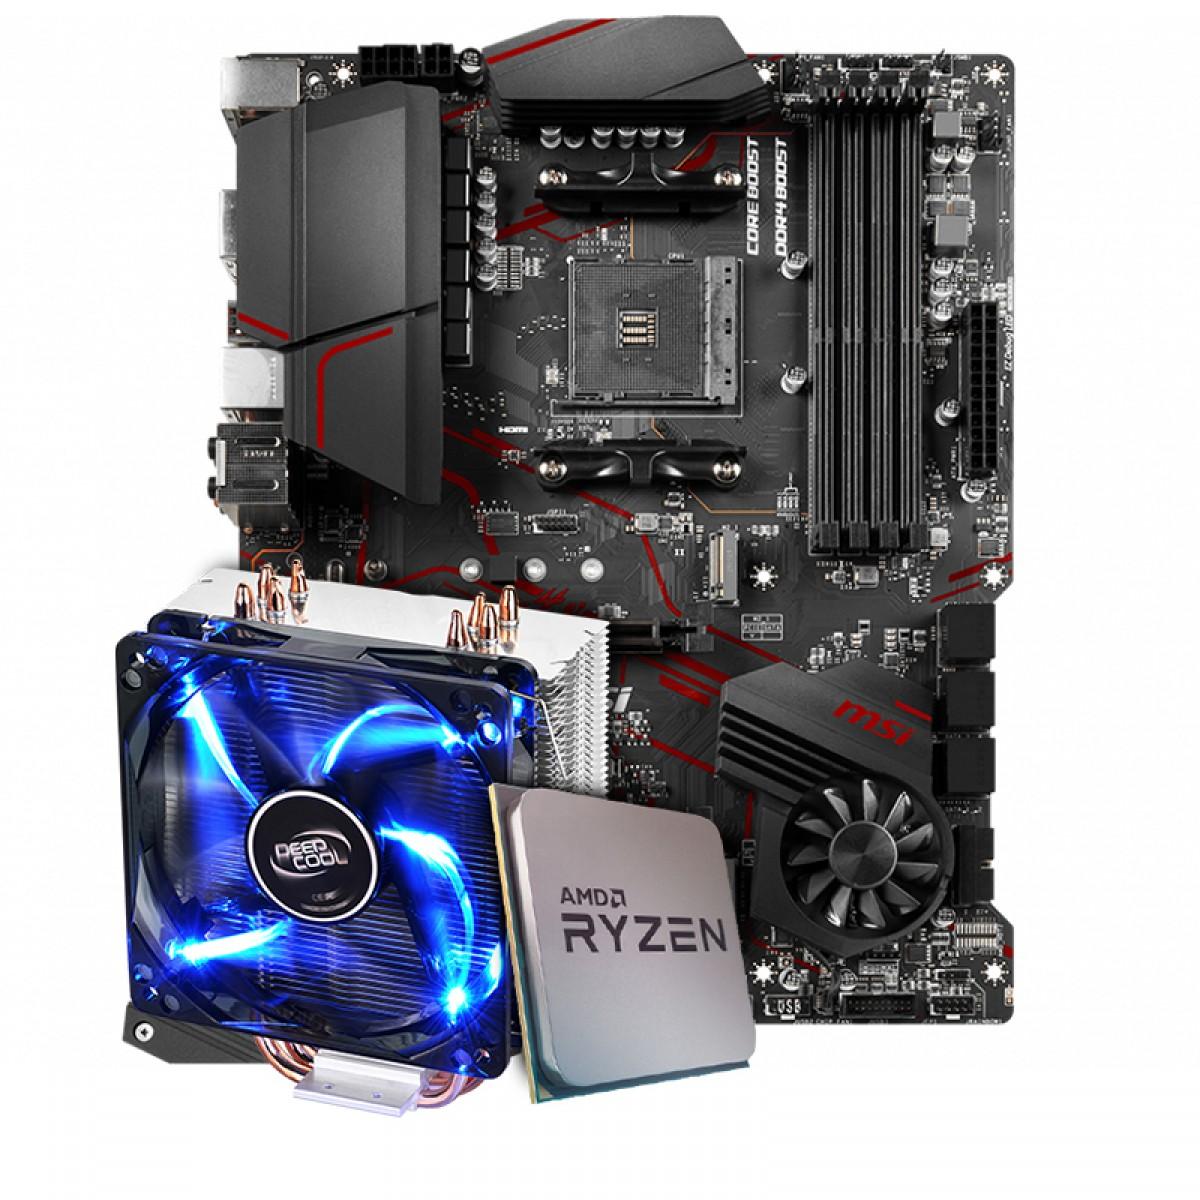 Kit Upgrade Placa Mãe MSI MPG X570 Gaming Plus, AMD AM4 + Processador AMD Ryzen 7 3800x 3.9GHz